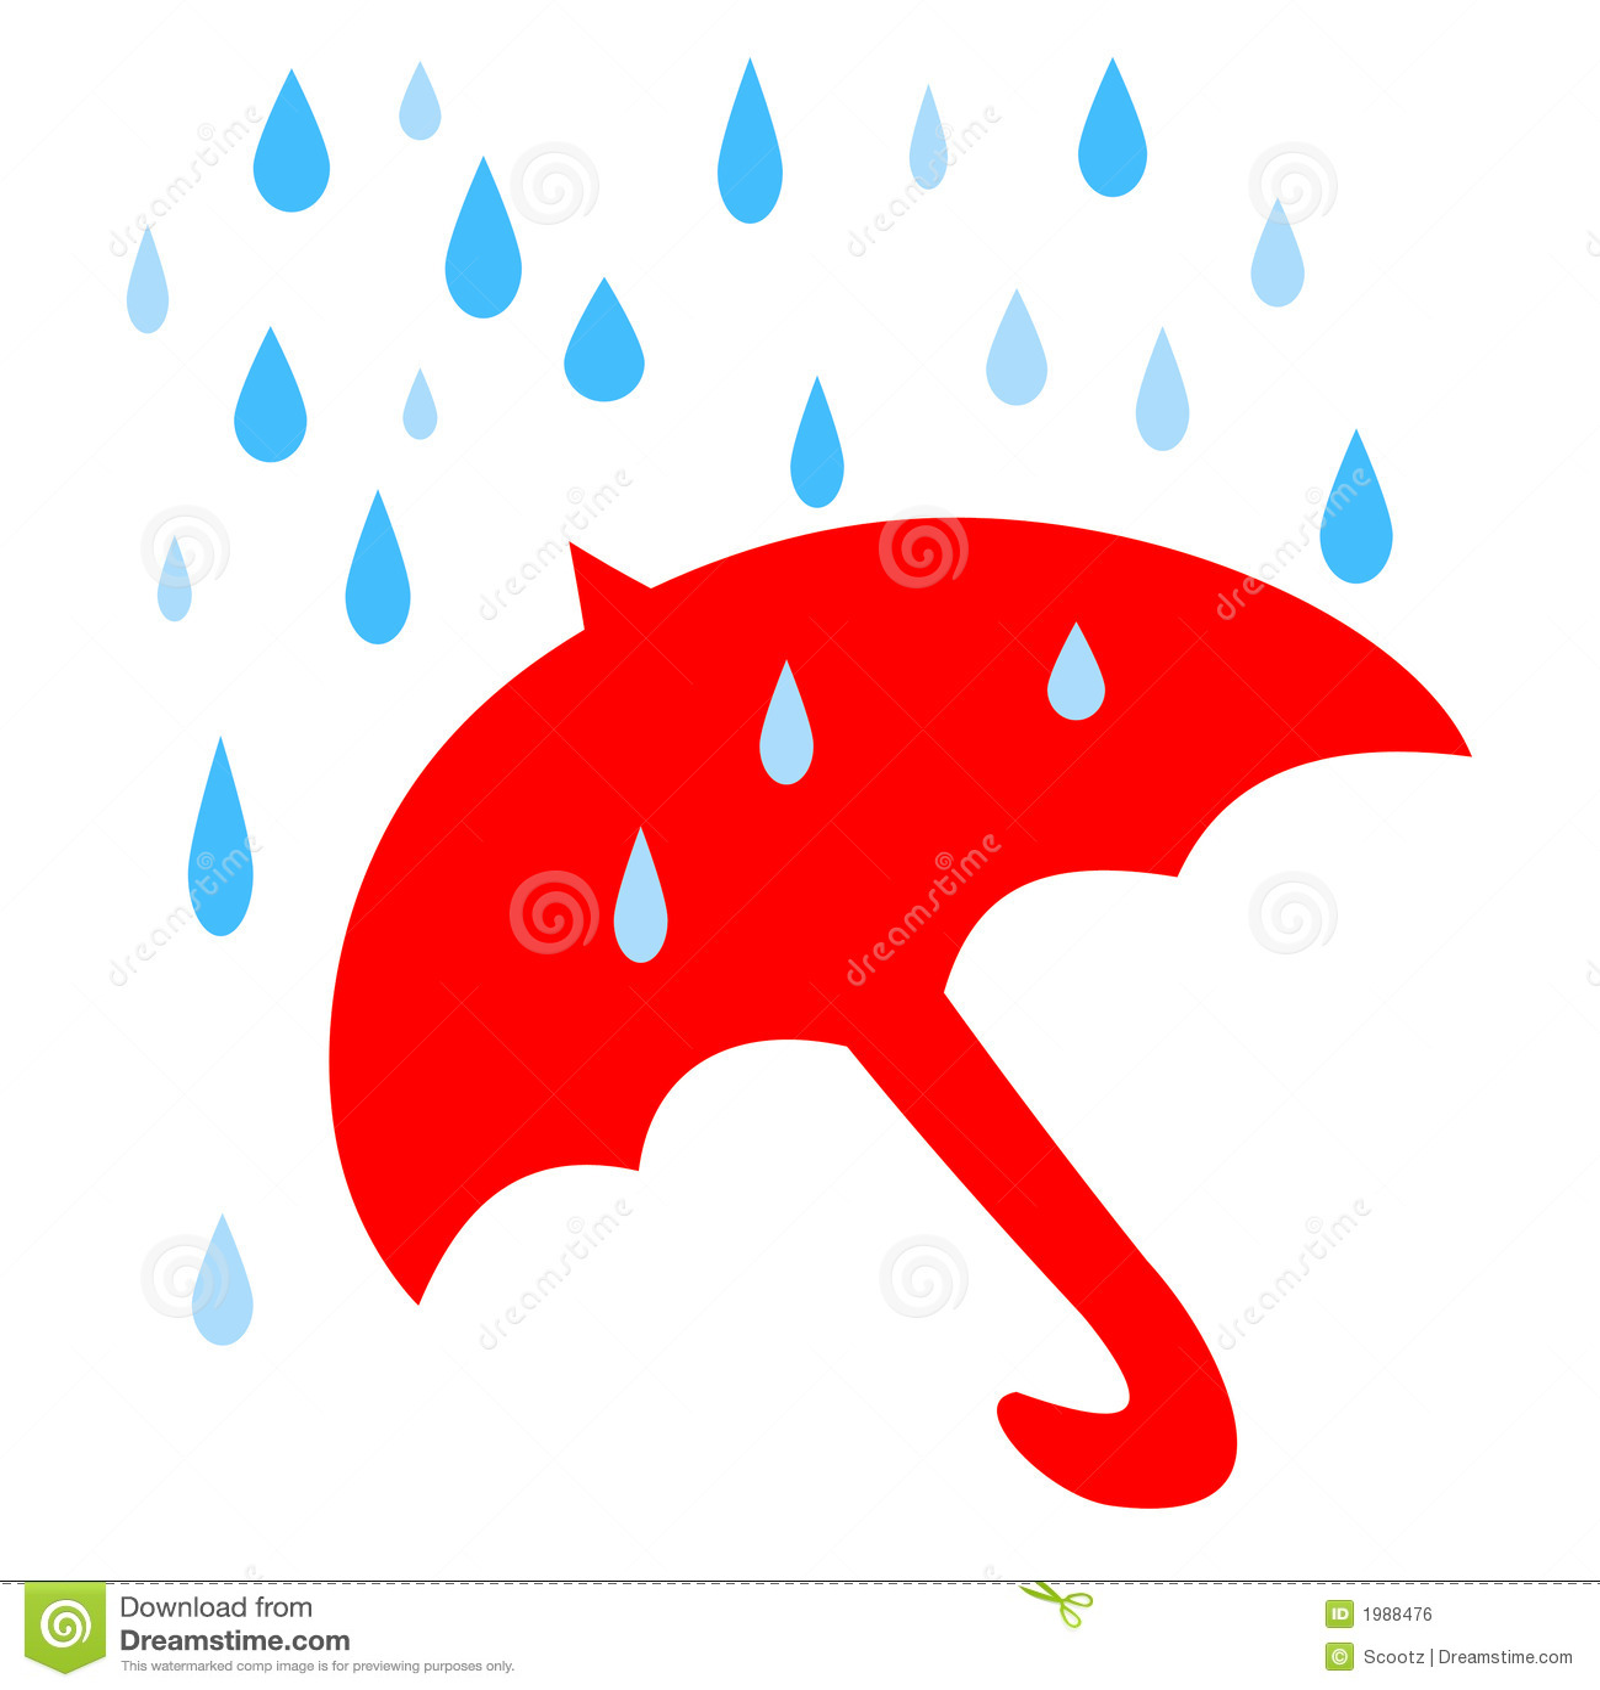 Rain Umbrella Clip Art Red umbrella rain Rain Umbrella Background